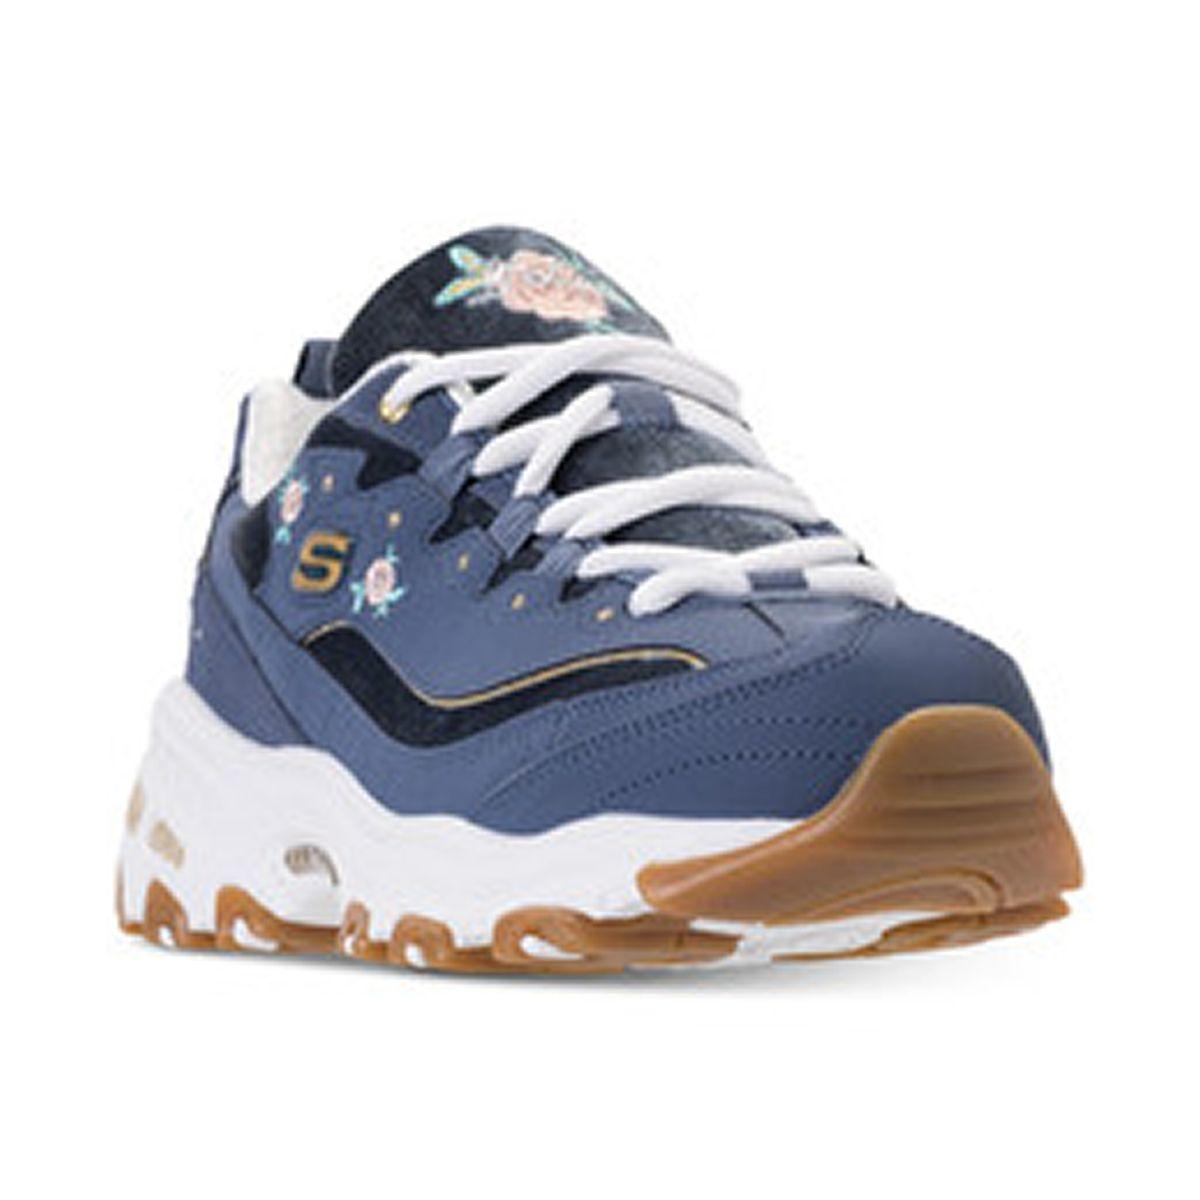 b4cbef1818e9fe Skechers. Skechers. Macy s    Shoes    Finish Line Athletic Sneakers ...